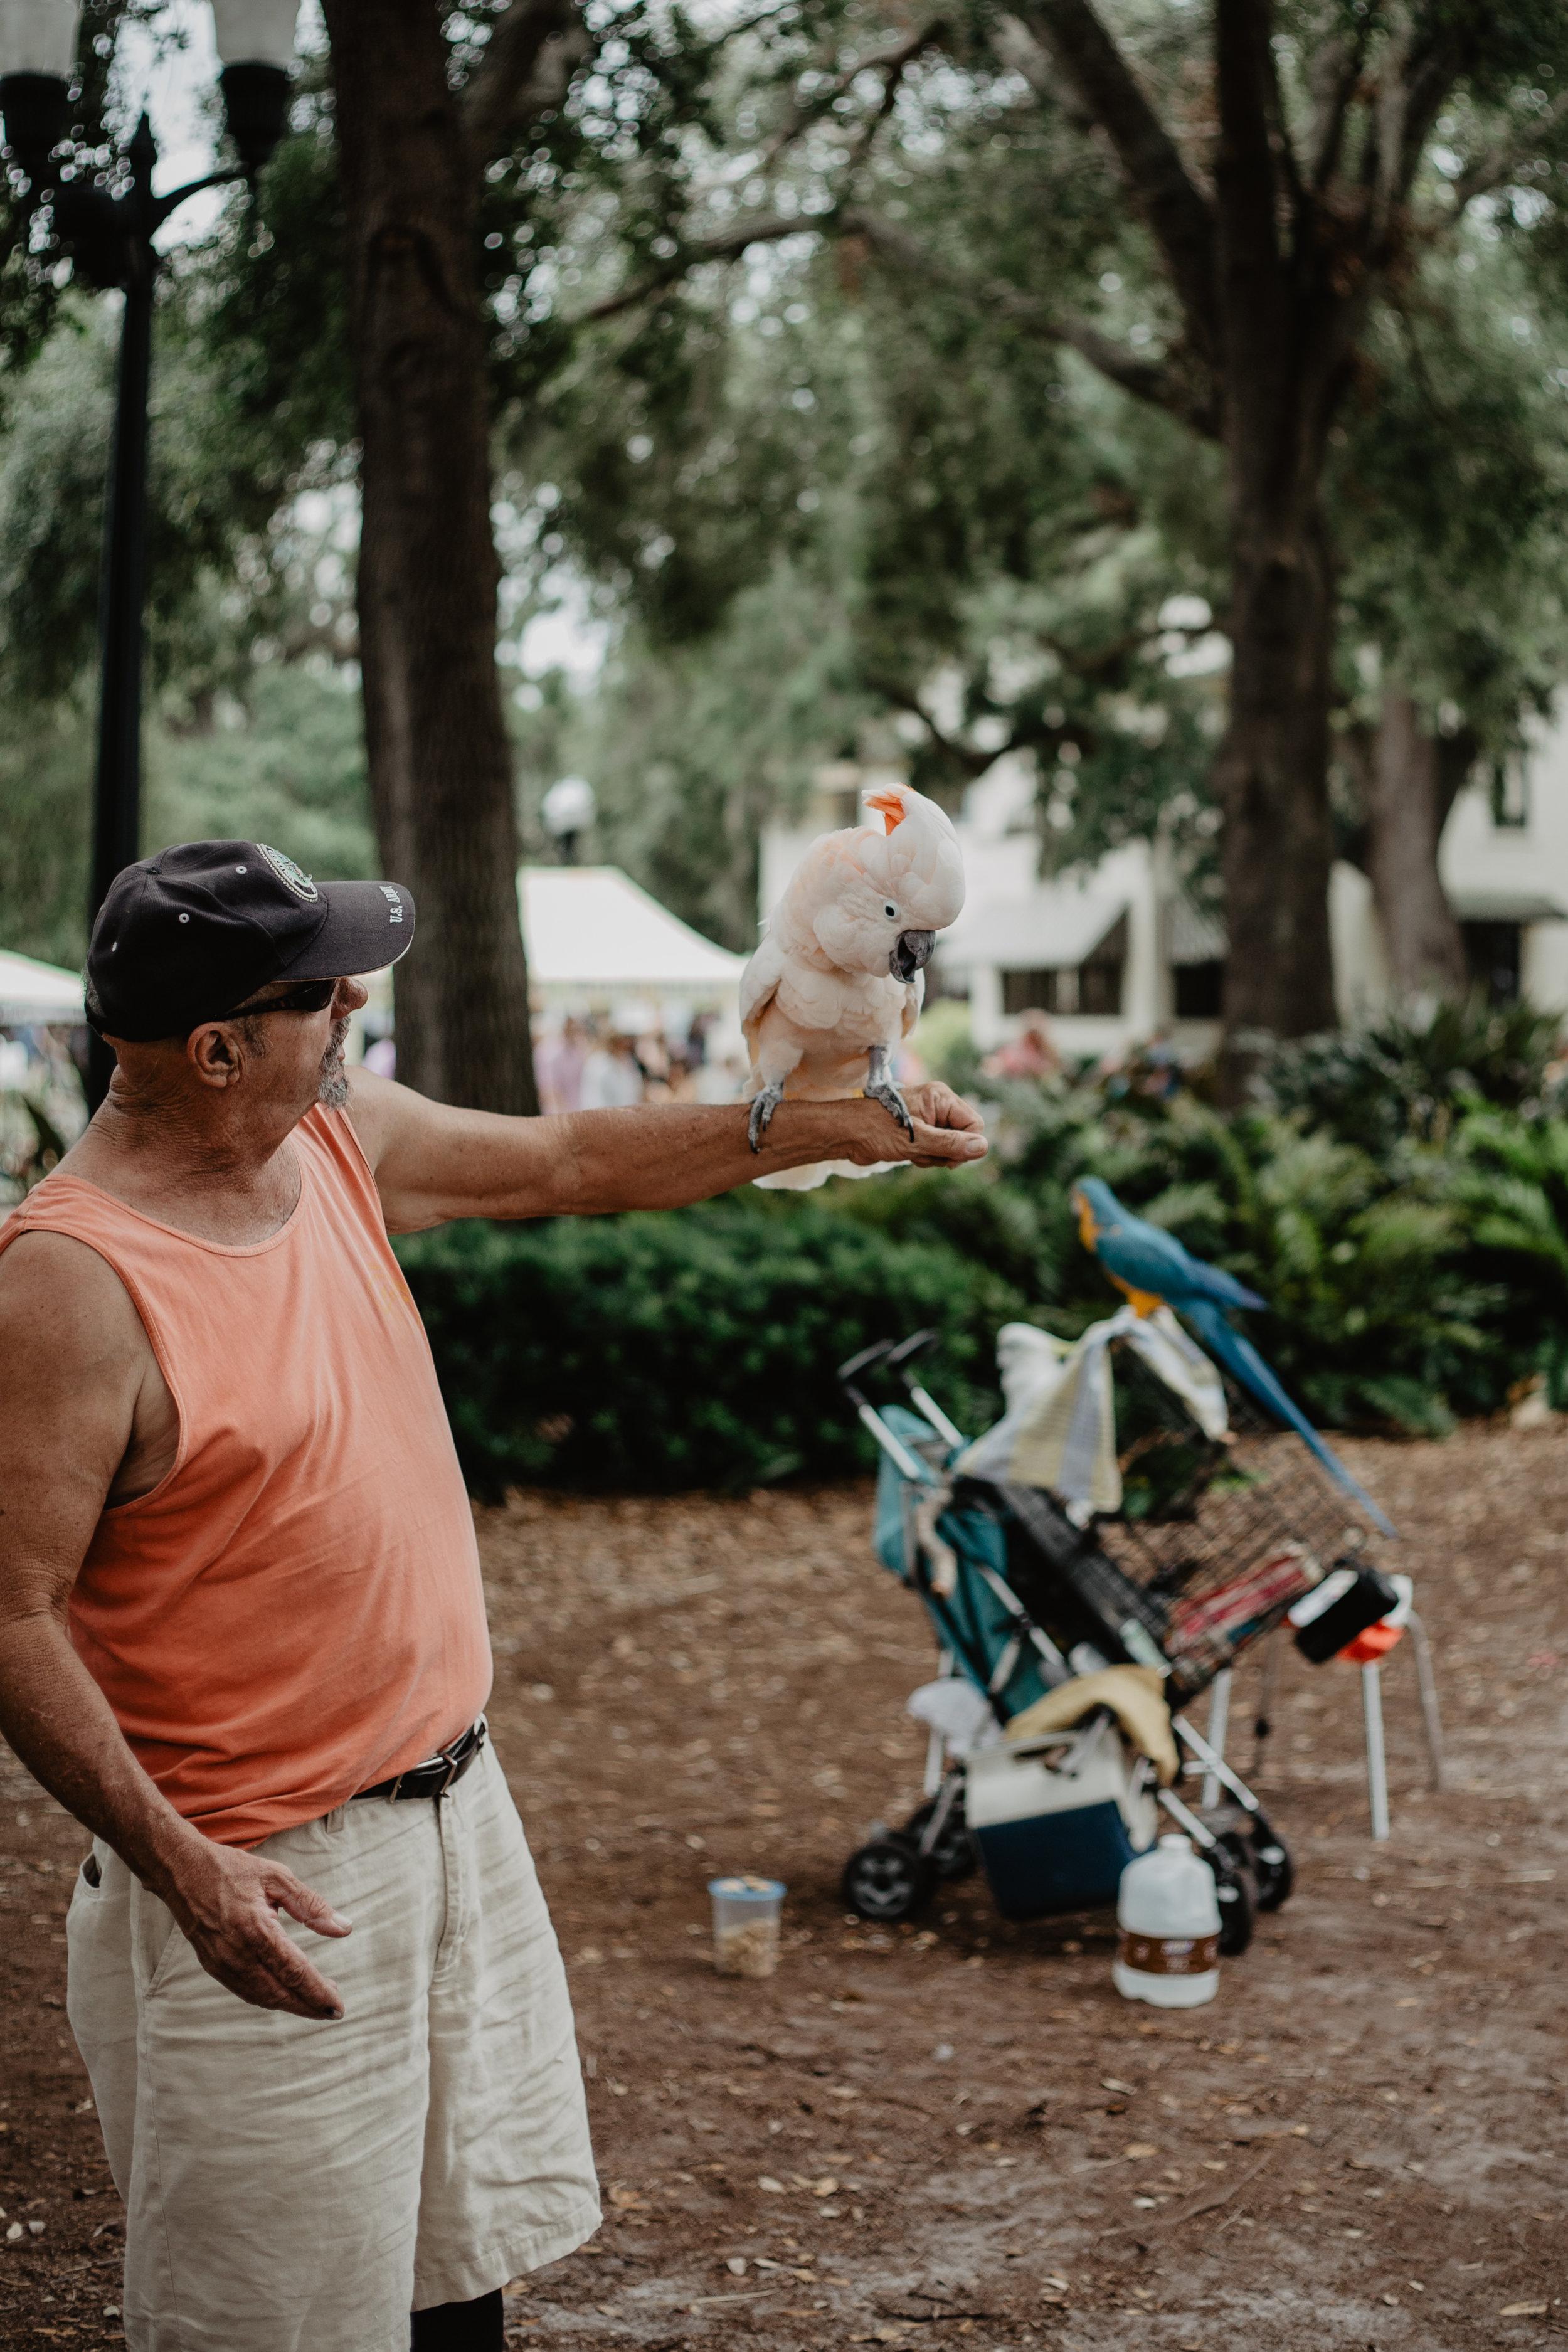 Orlando-48.jpg